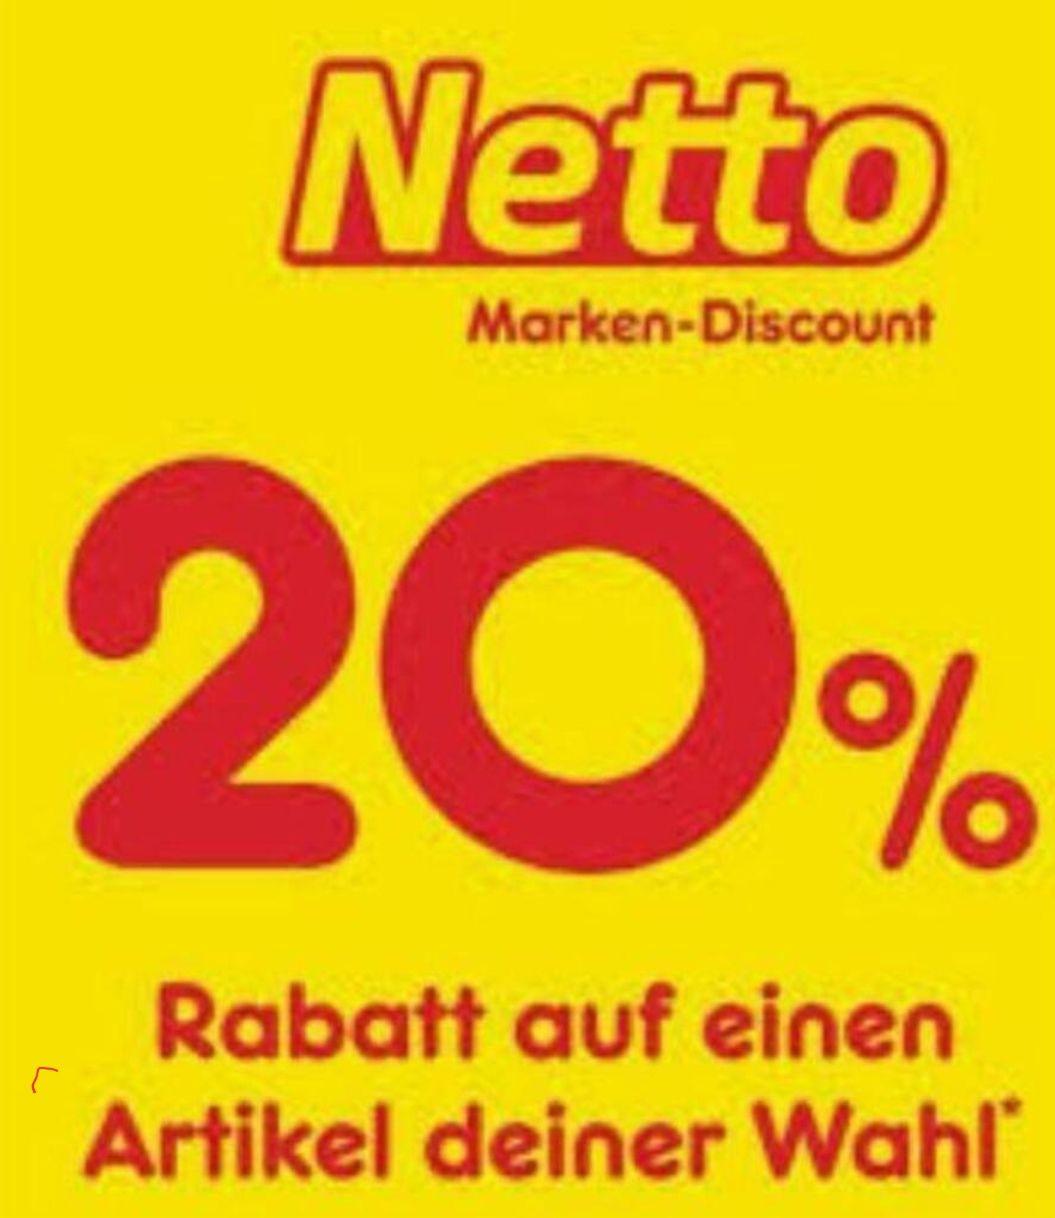 [Netto MD] Rabatt Coupons KW12 (22.03. - 27.03.), bundesweit einsetzbar